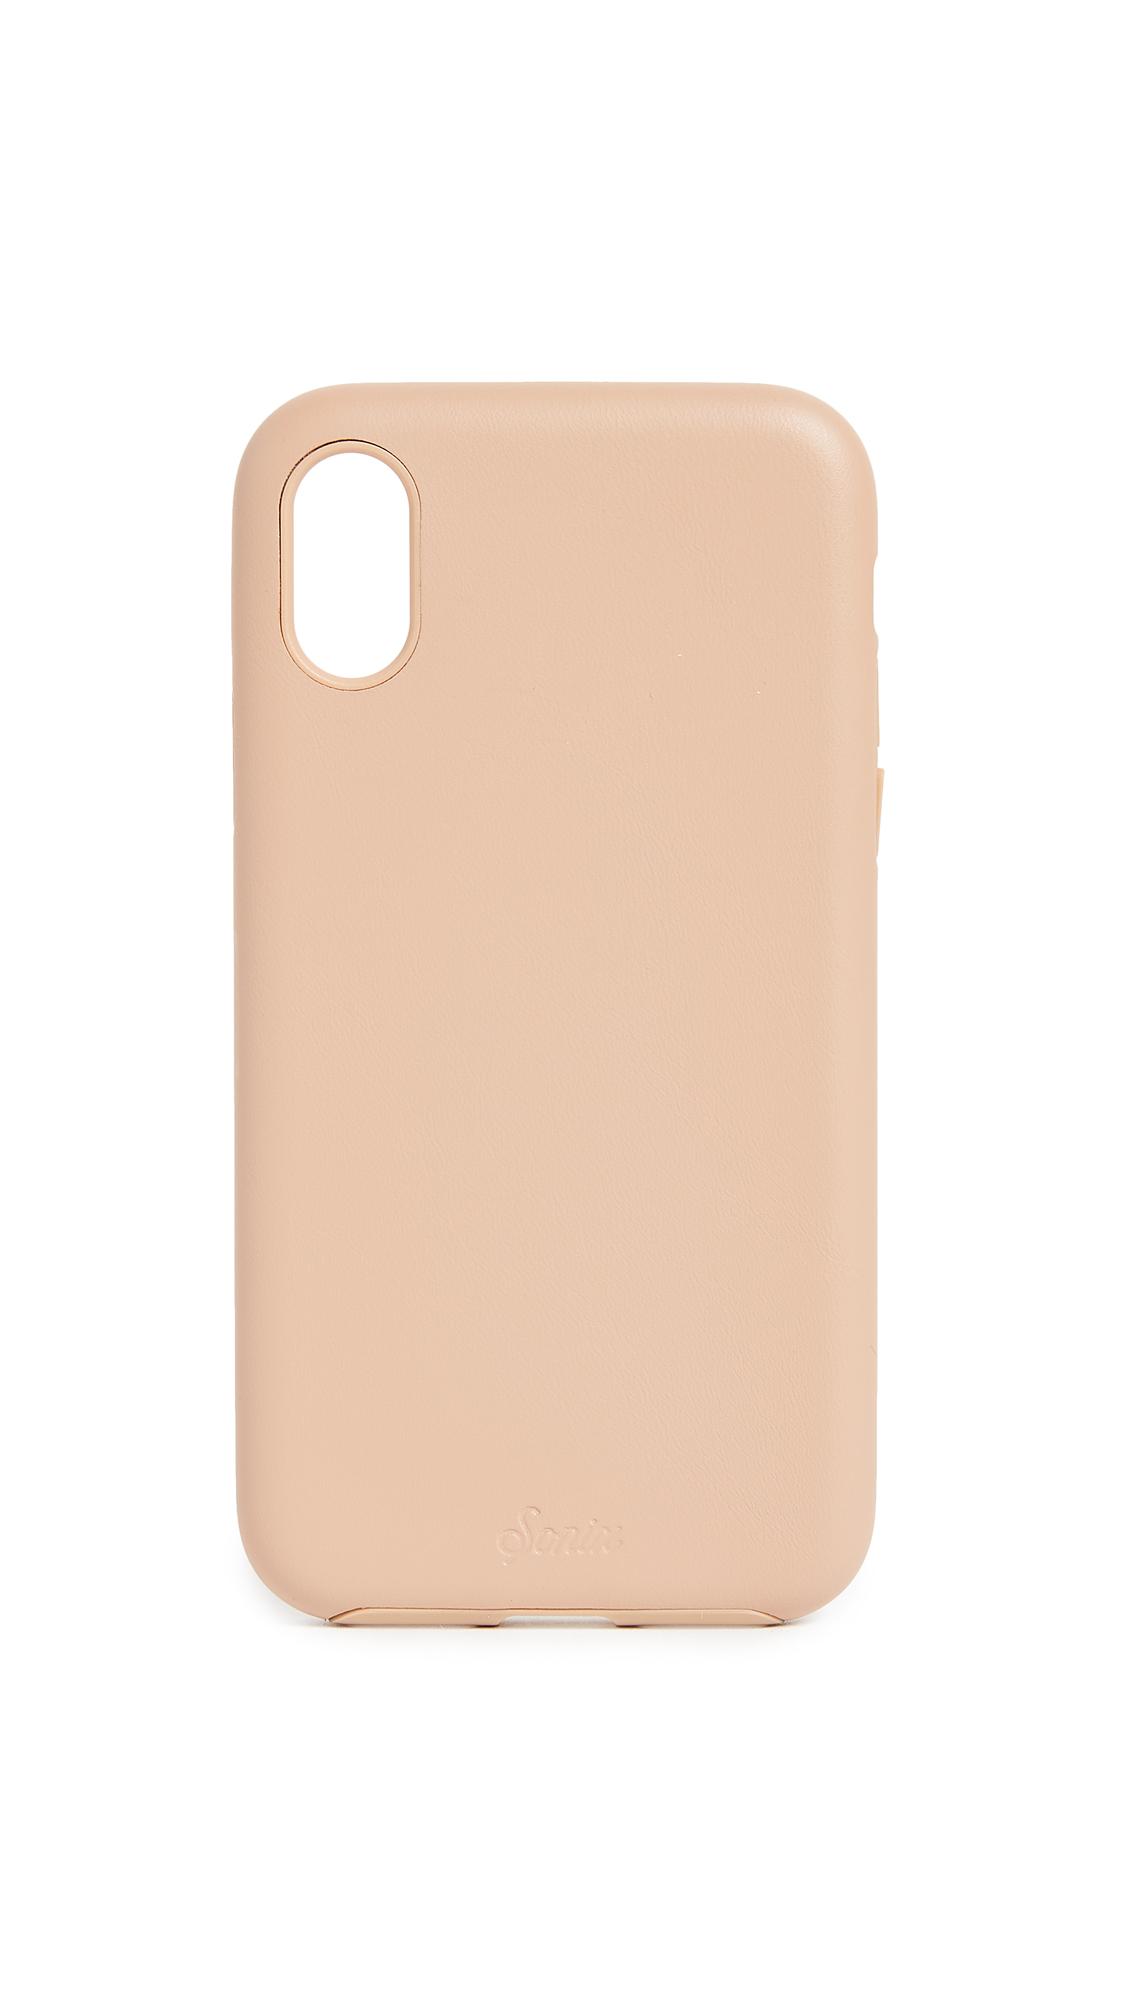 Sonix Leather iPhone X Case - Tan